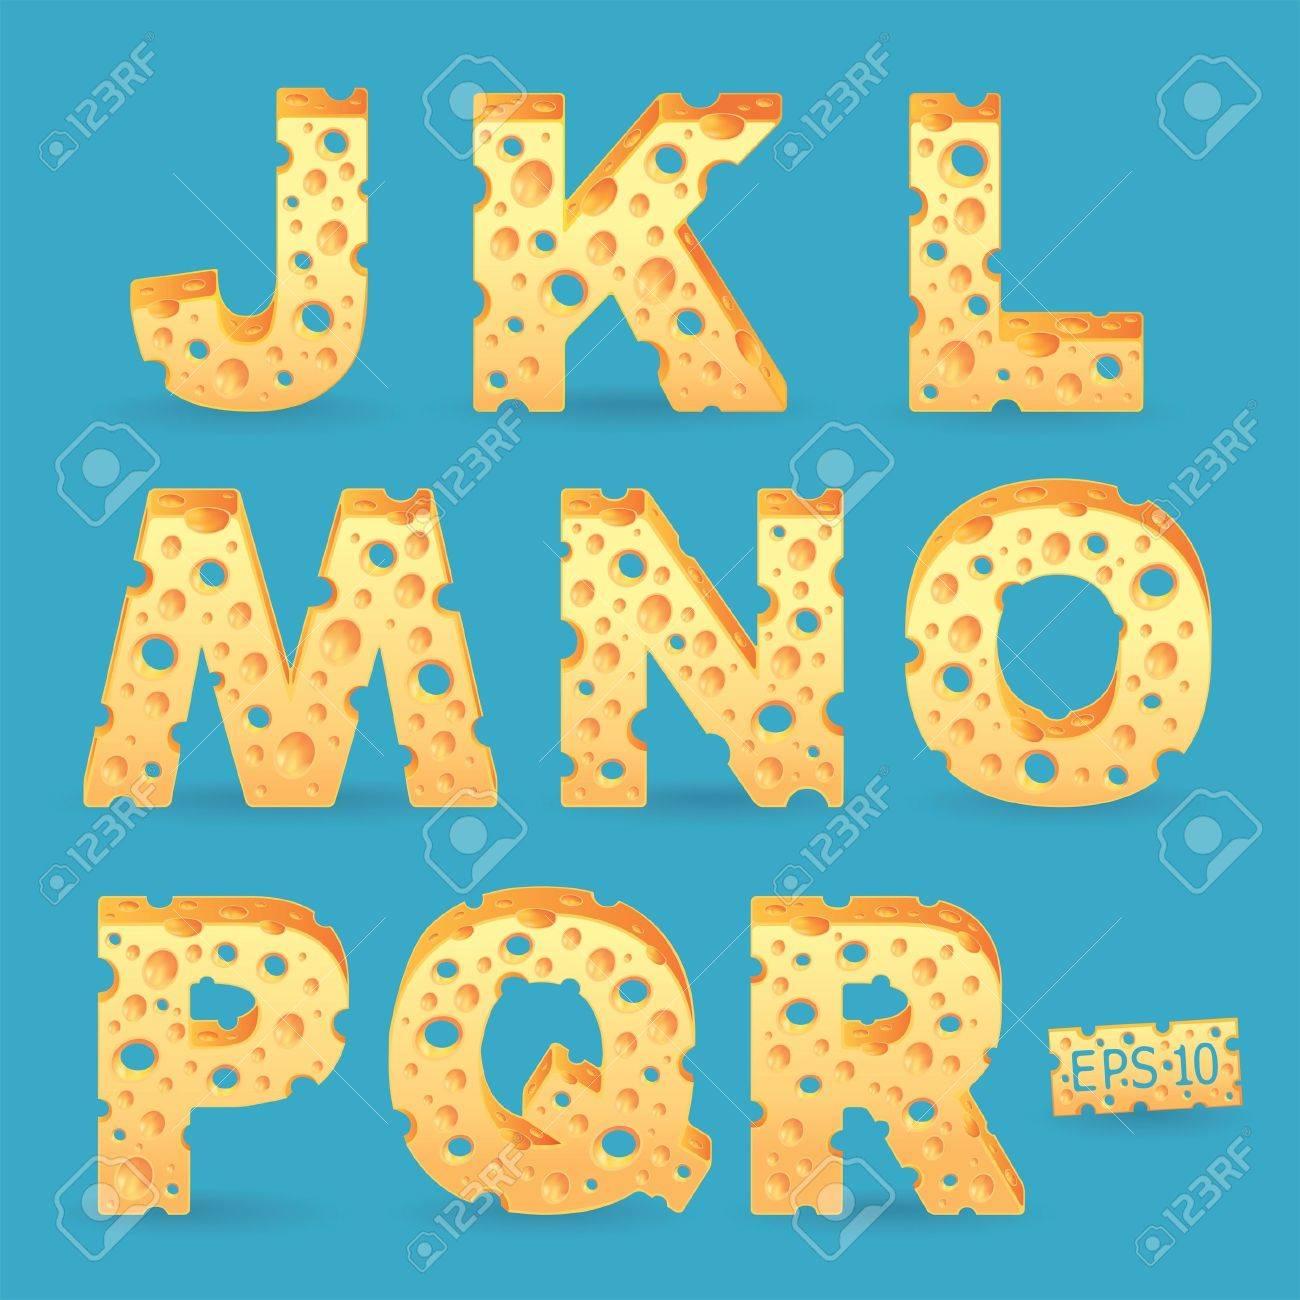 Cheese alphabet set illustration  More typeface style in my portfolio Stock Vector - 18458560